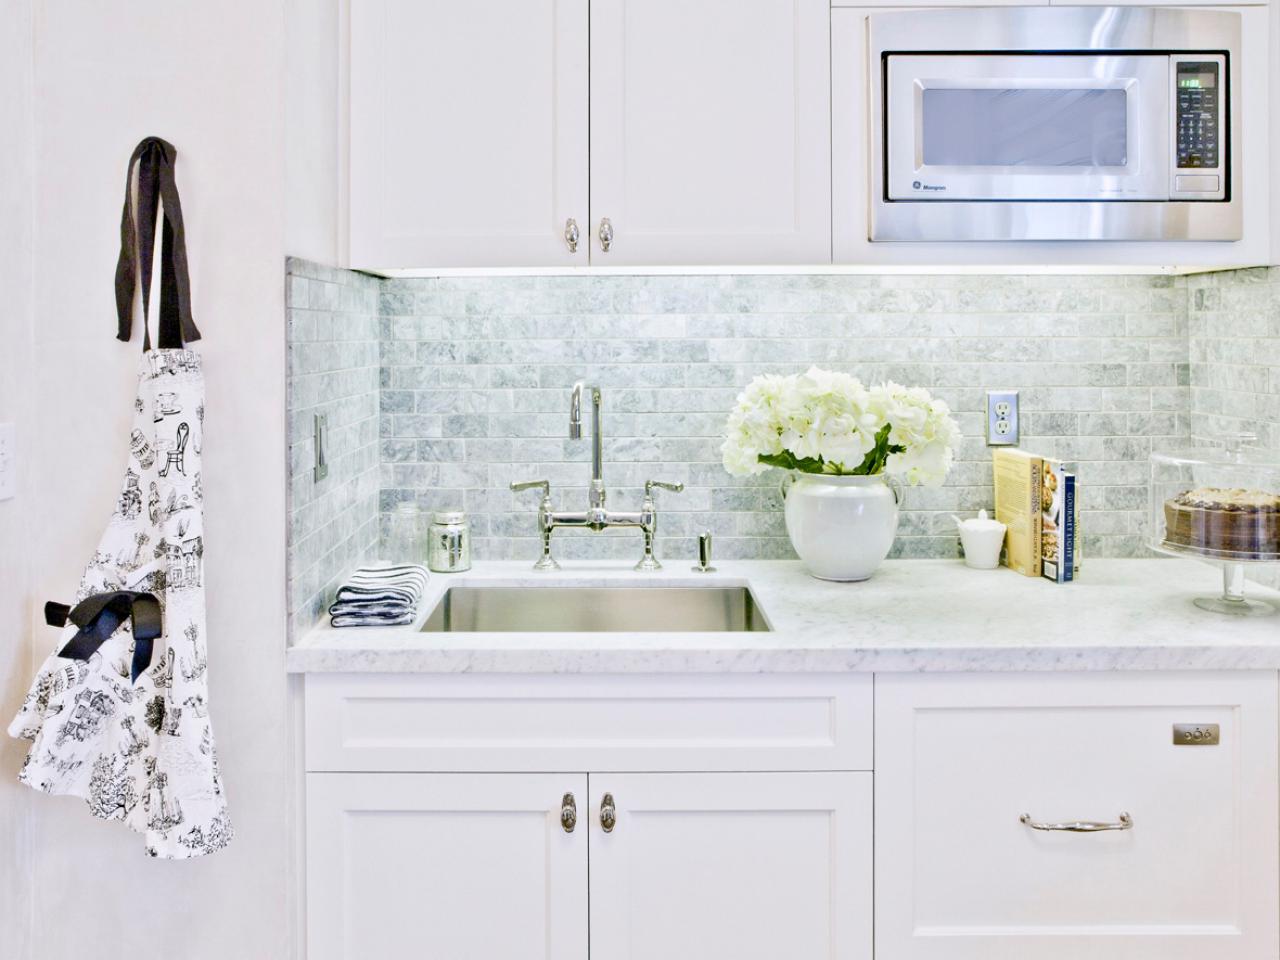 Cara Memasang Marmer Pada Kitchen Set Untuk Mempercantik Dapur